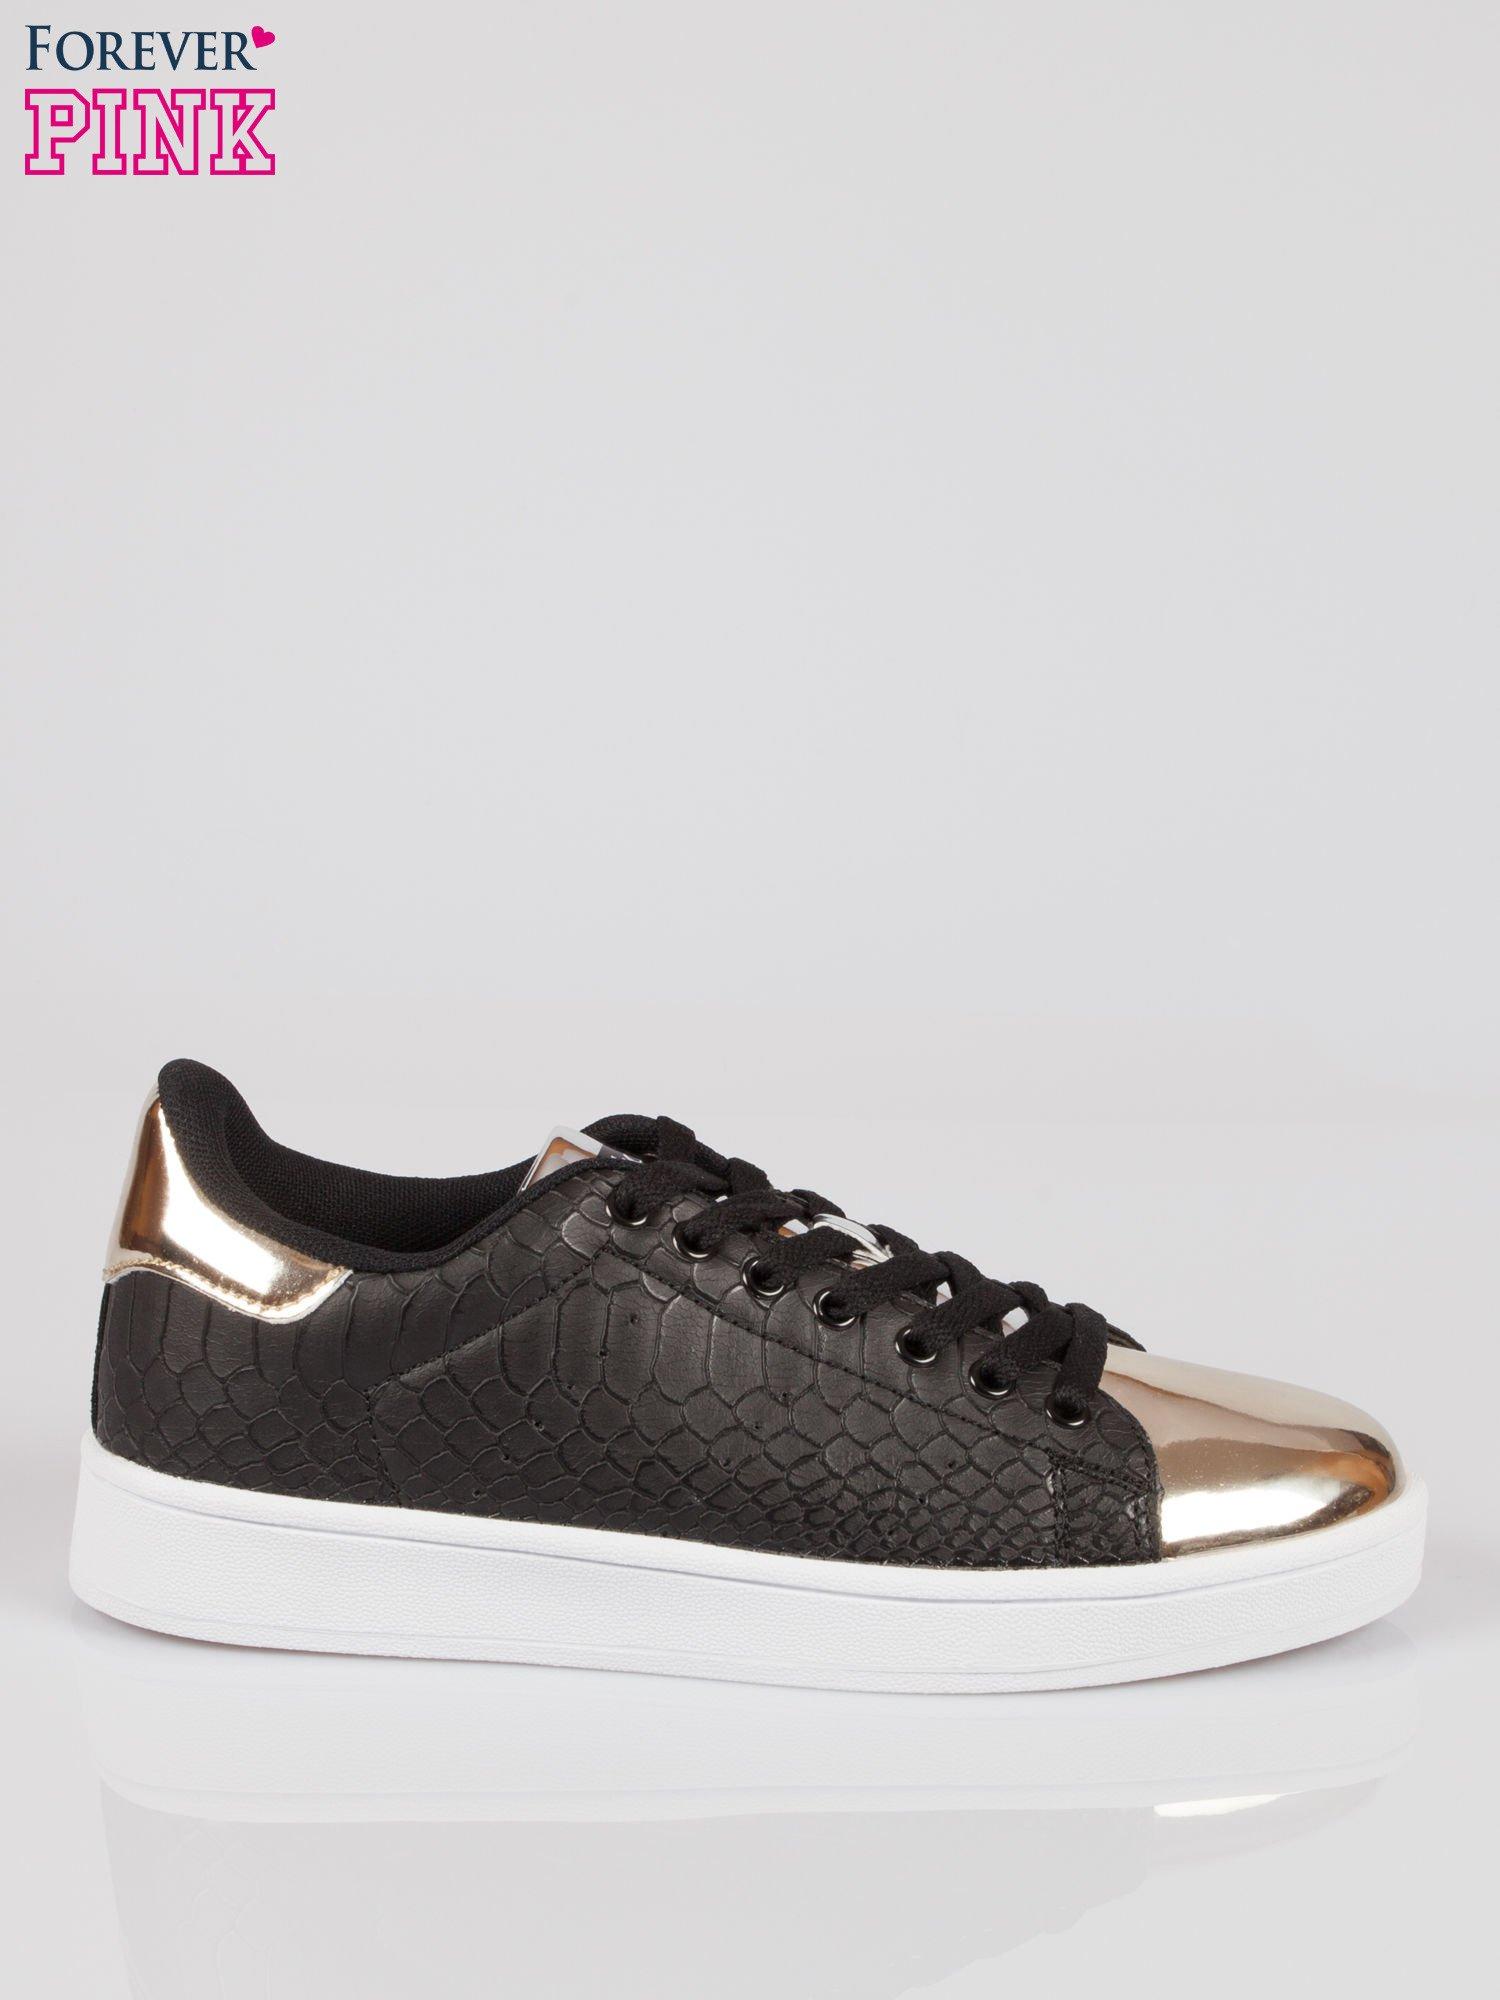 Czarne wężowe buty sportowe gold cap toe                                  zdj.                                  1